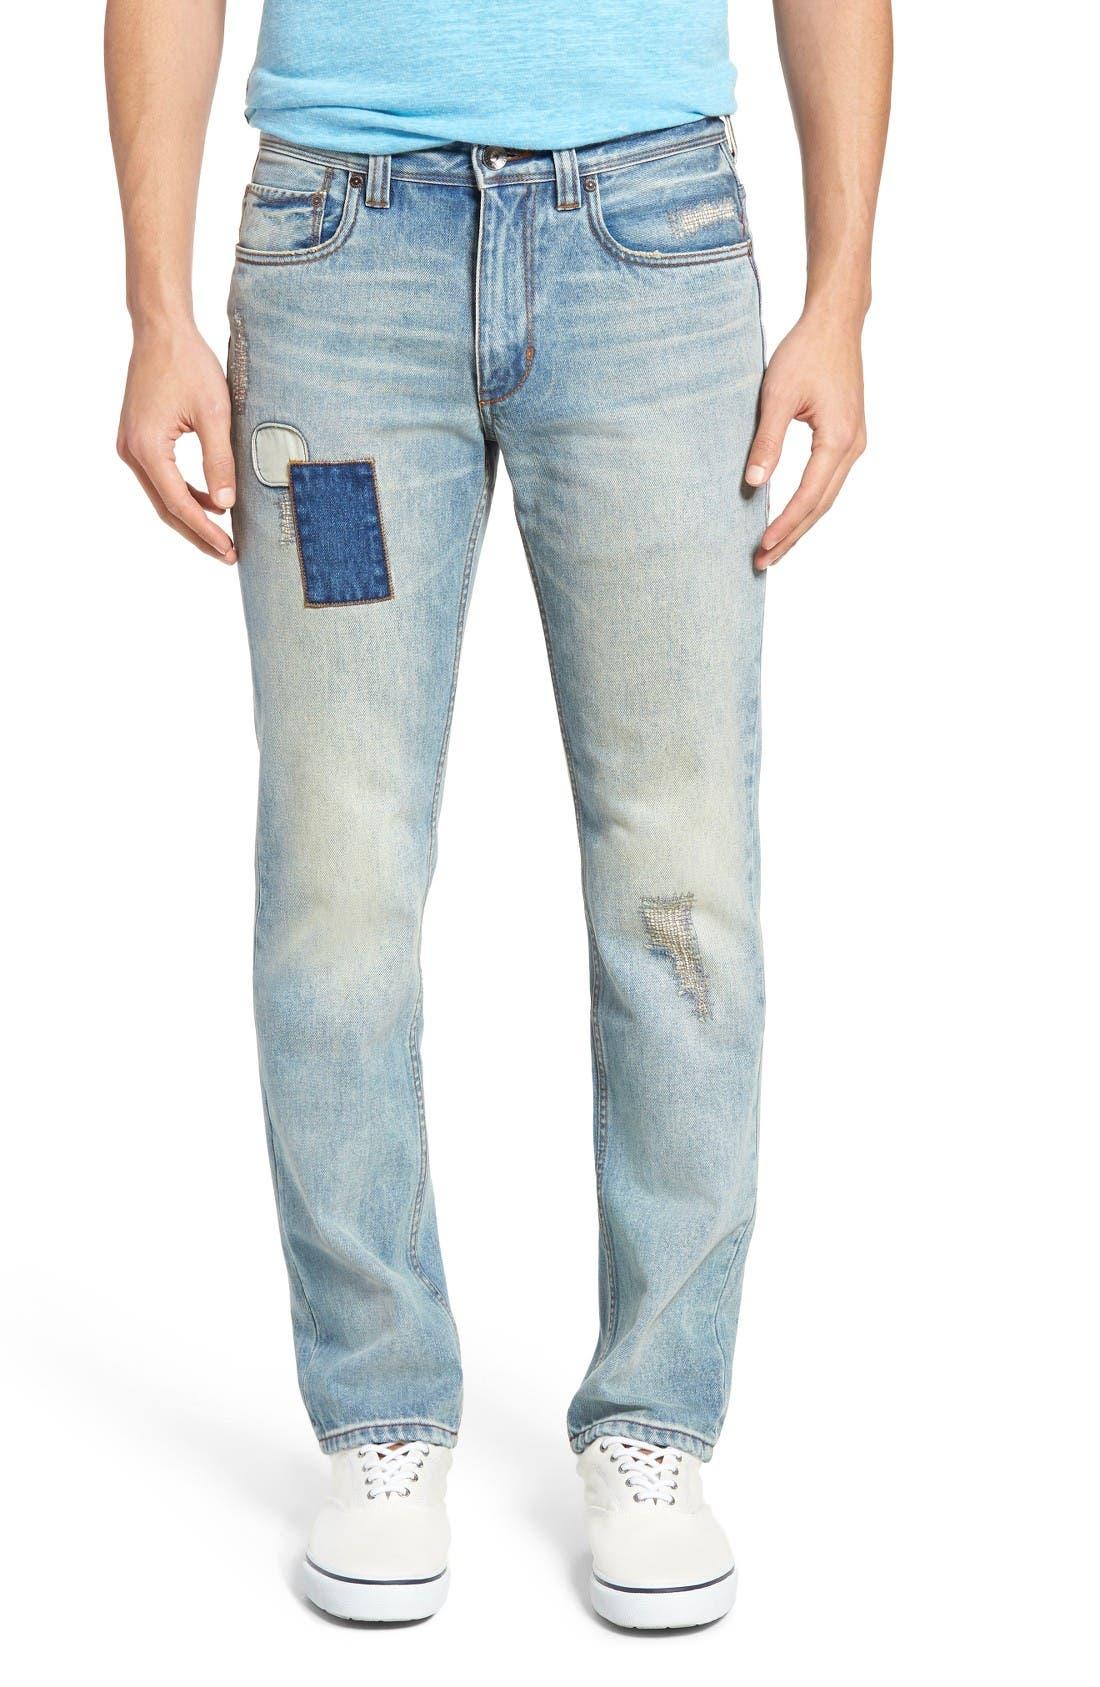 Castaway Slim Fit Jeans,                         Main,                         color, Bleached Vintage Wash